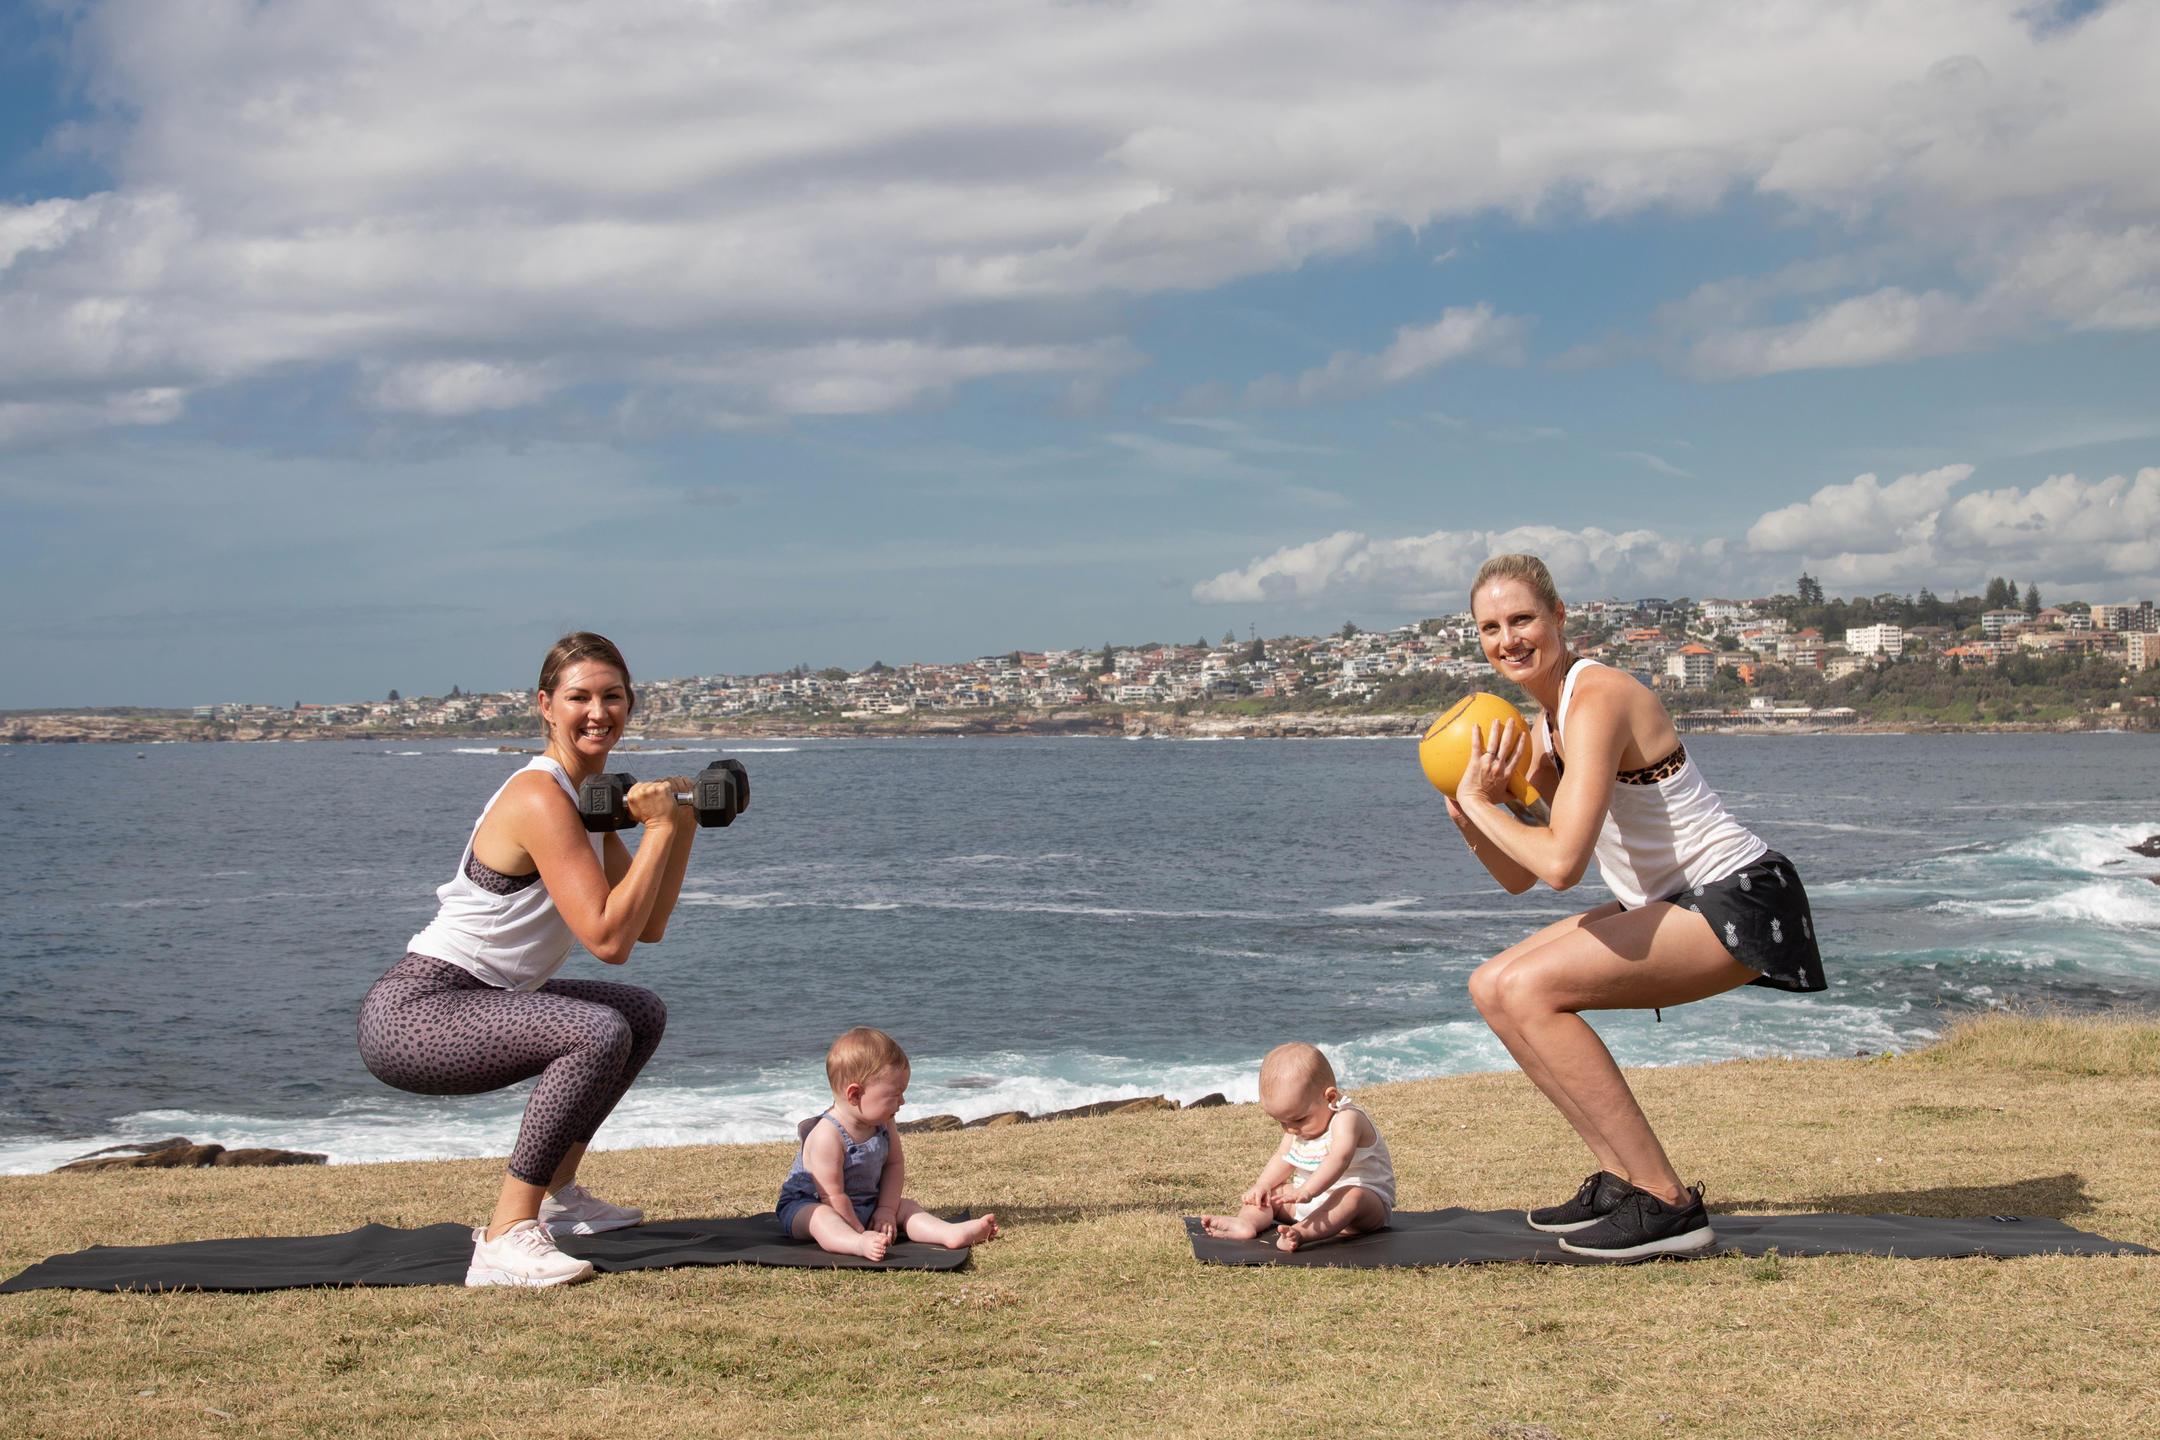 Postnatal Exercise, Postpartum Exercise, Postnatal Fitness, Postpartum Fitness, Empowered MOtherhood Program